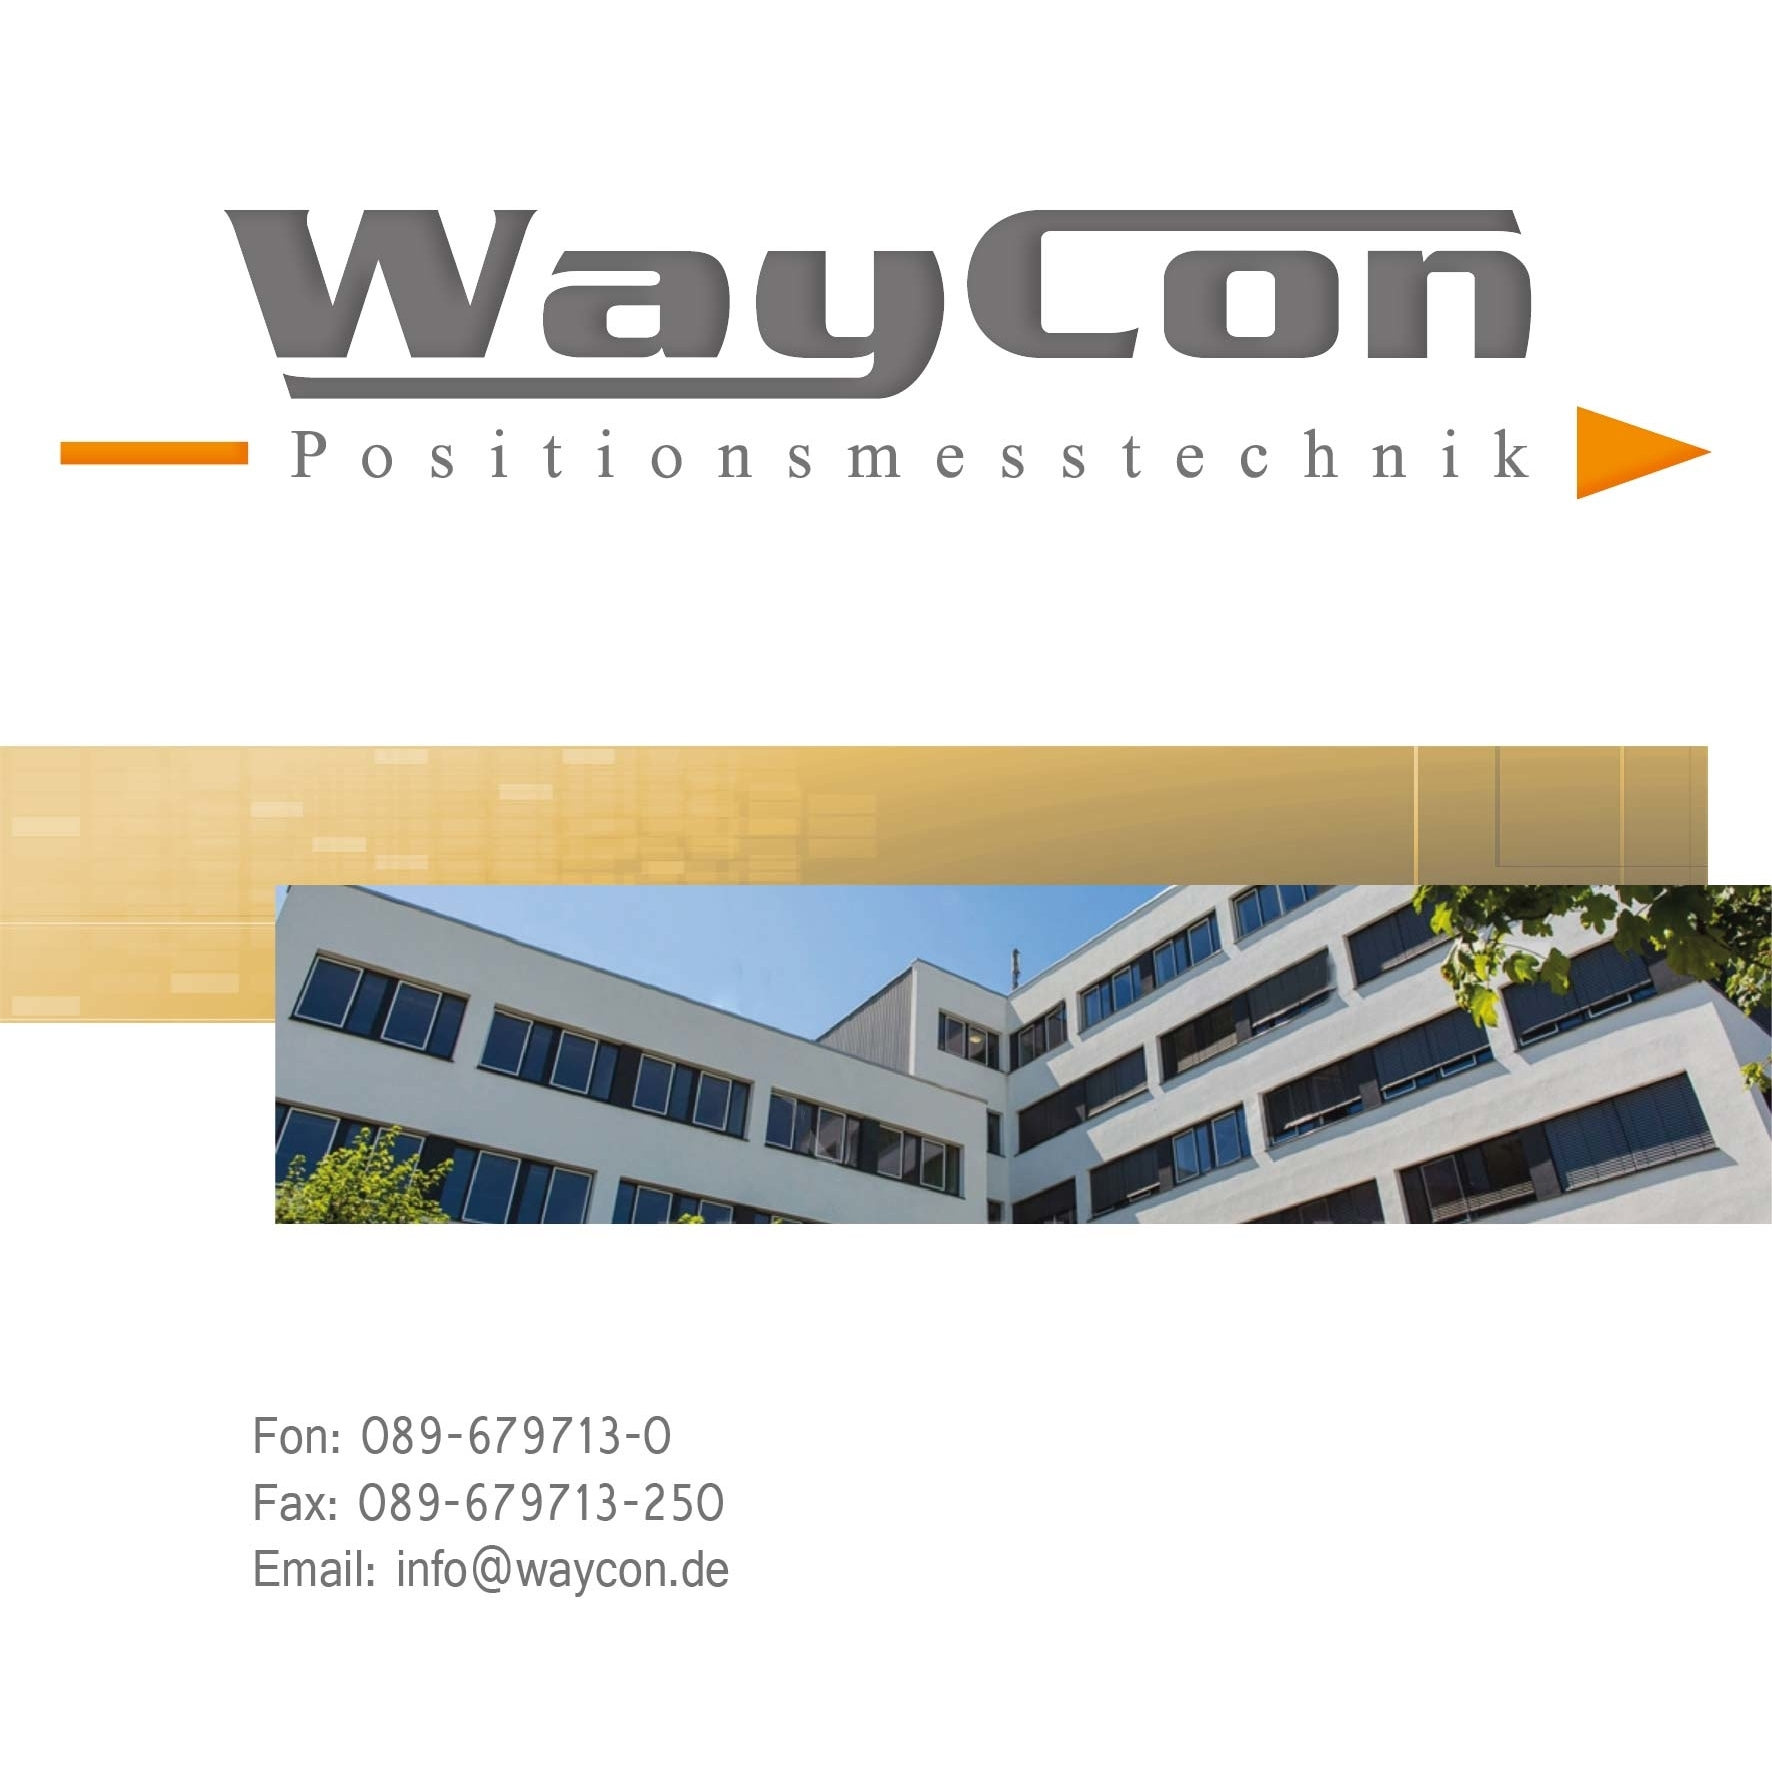 WayCon Positionsmesstechnik GmbH